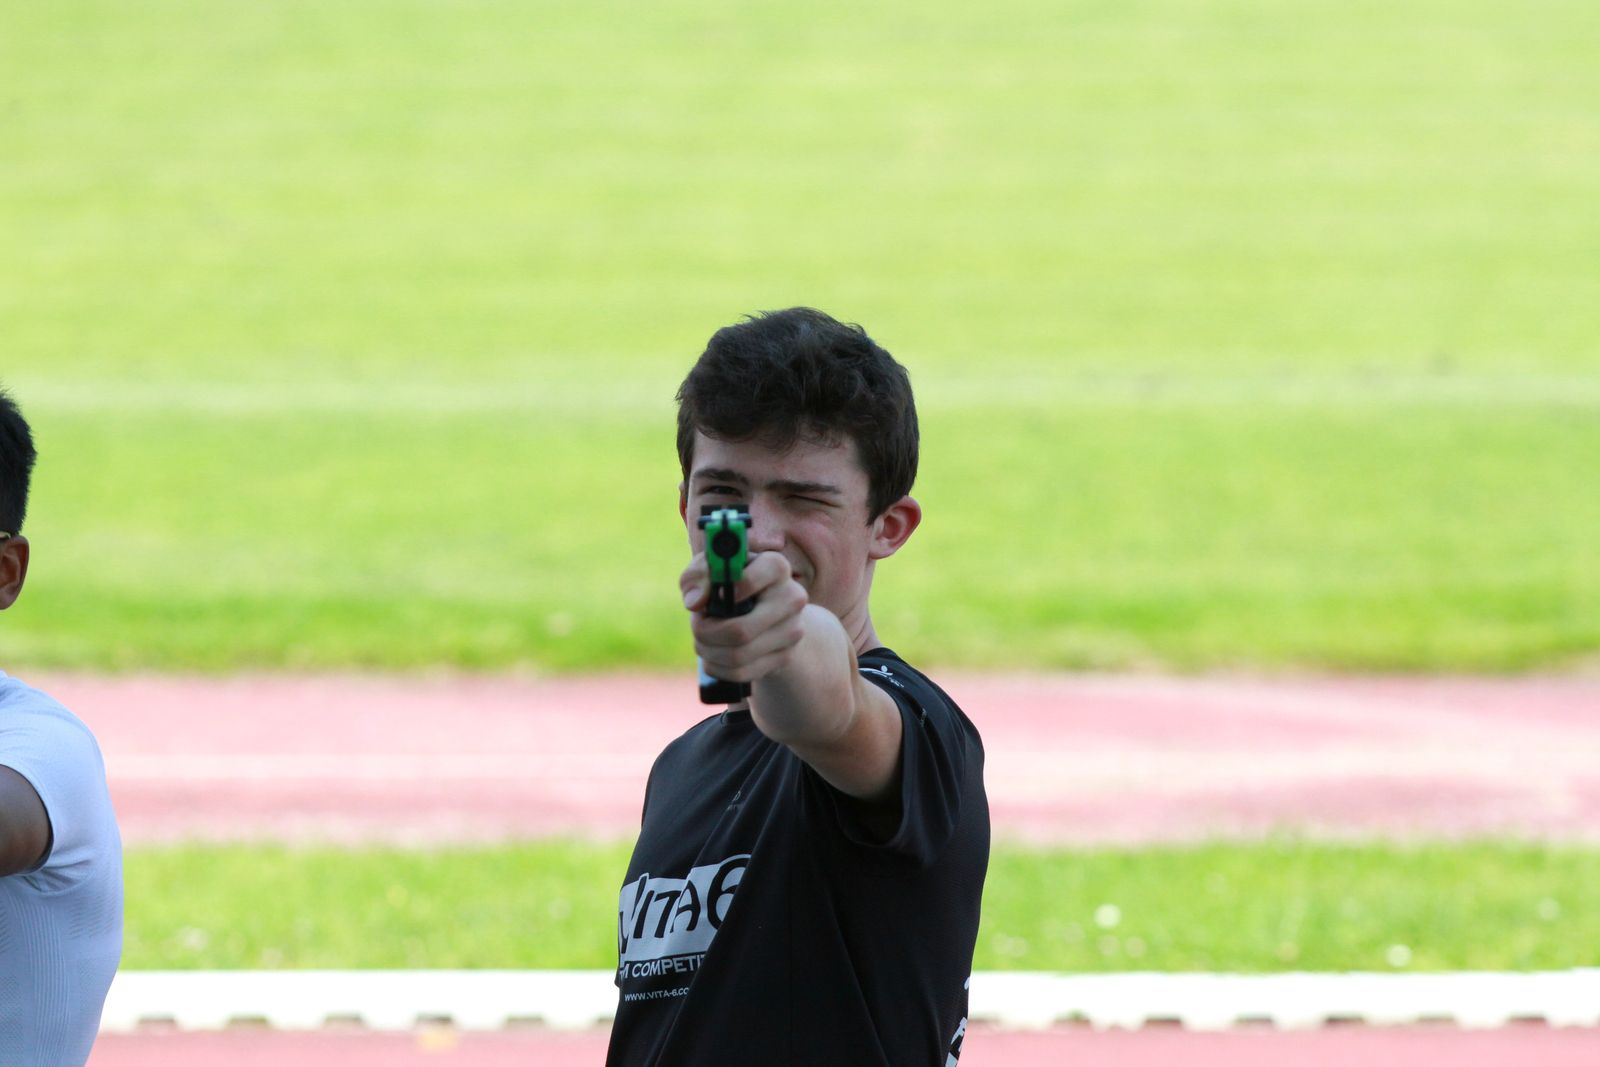 Performance Epée U20-U23 2021 - Album Jour 4 - Mercredi 11 août